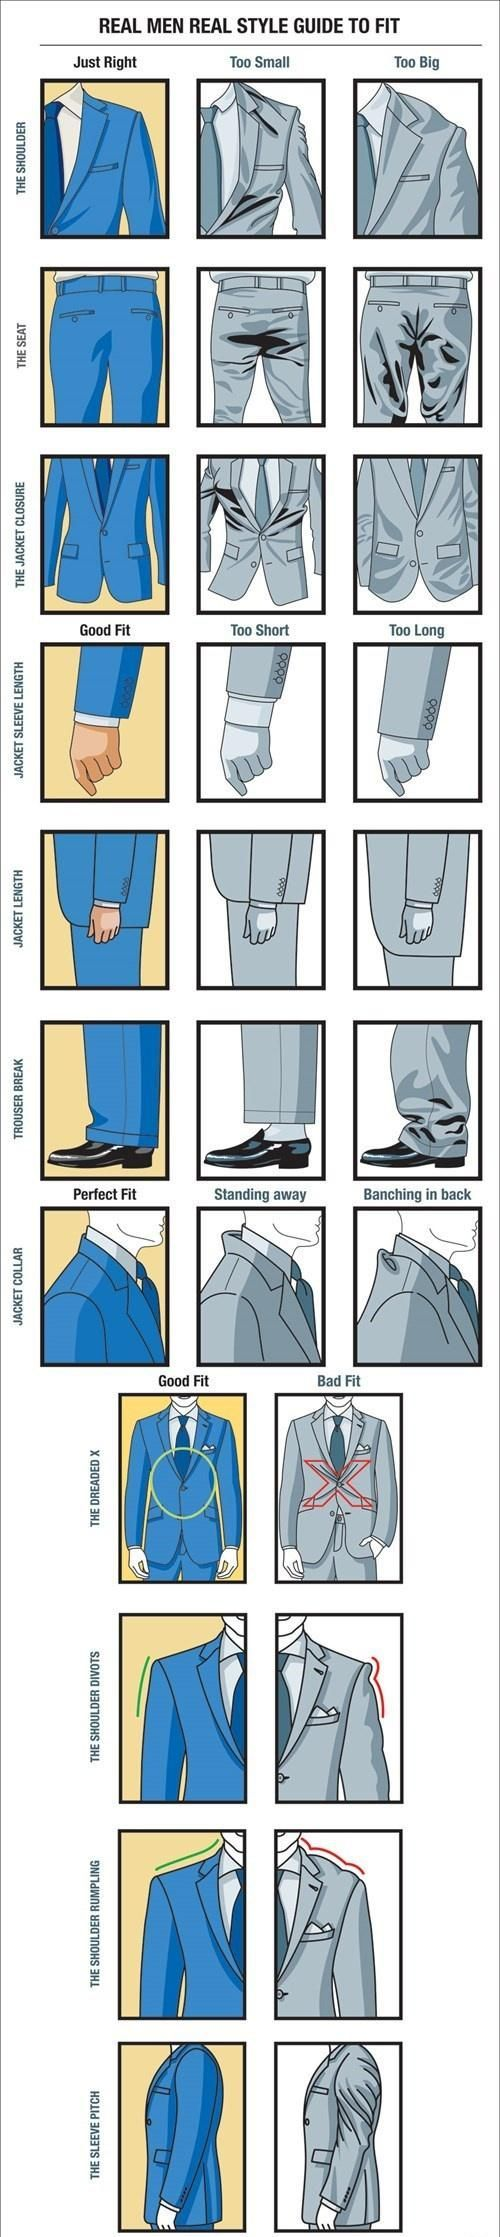 Trajes, hermosos trajes masculinos :3